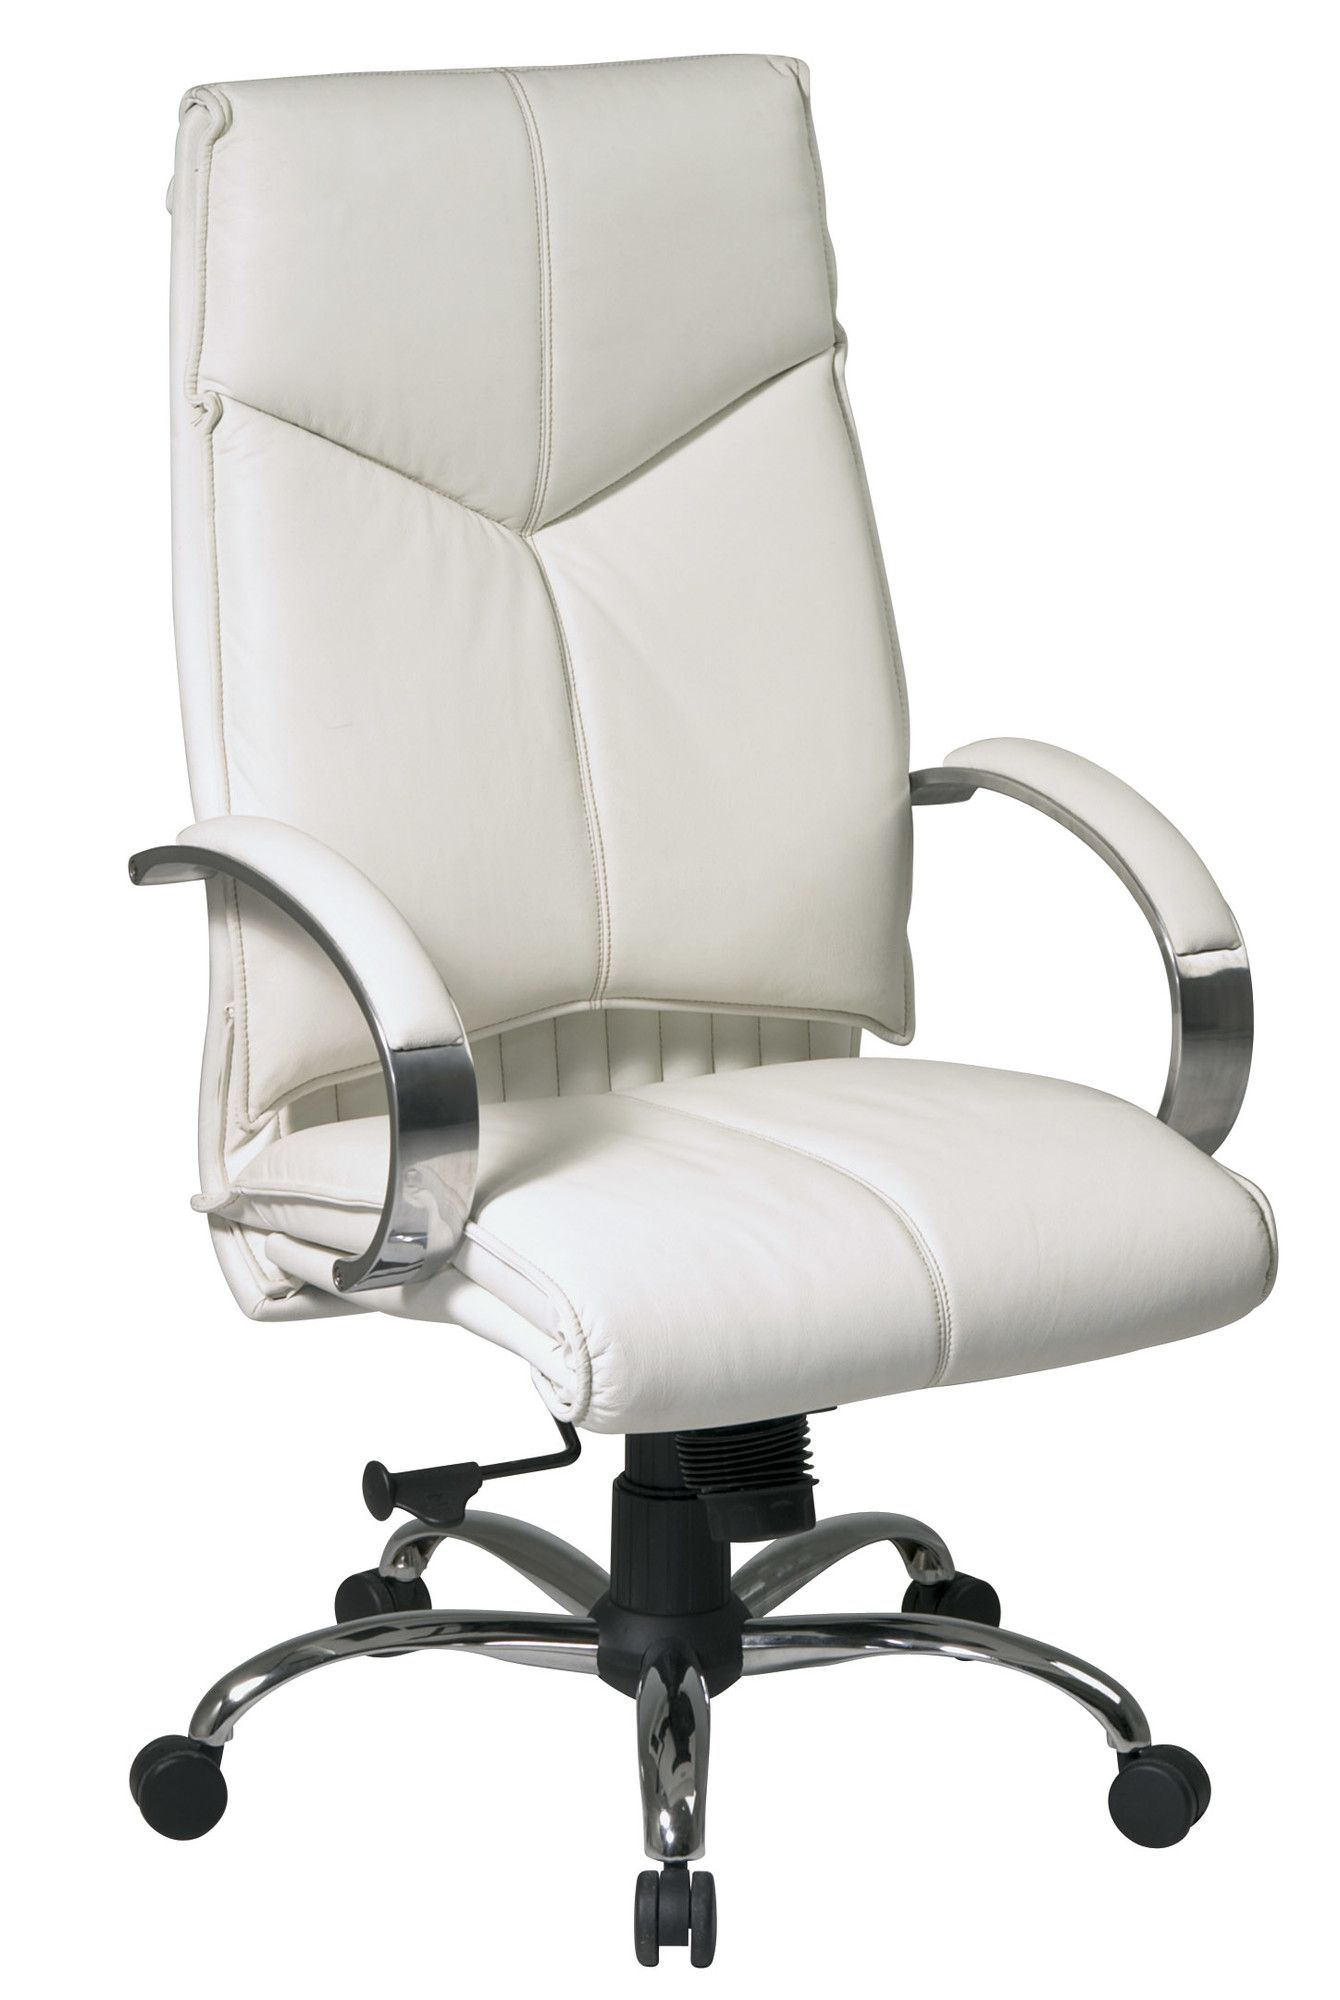 pro line ii series high back leather executive chair feminine aqua rh pinterest com Chevron Desk Chair Velvet Tufted Desk Chair